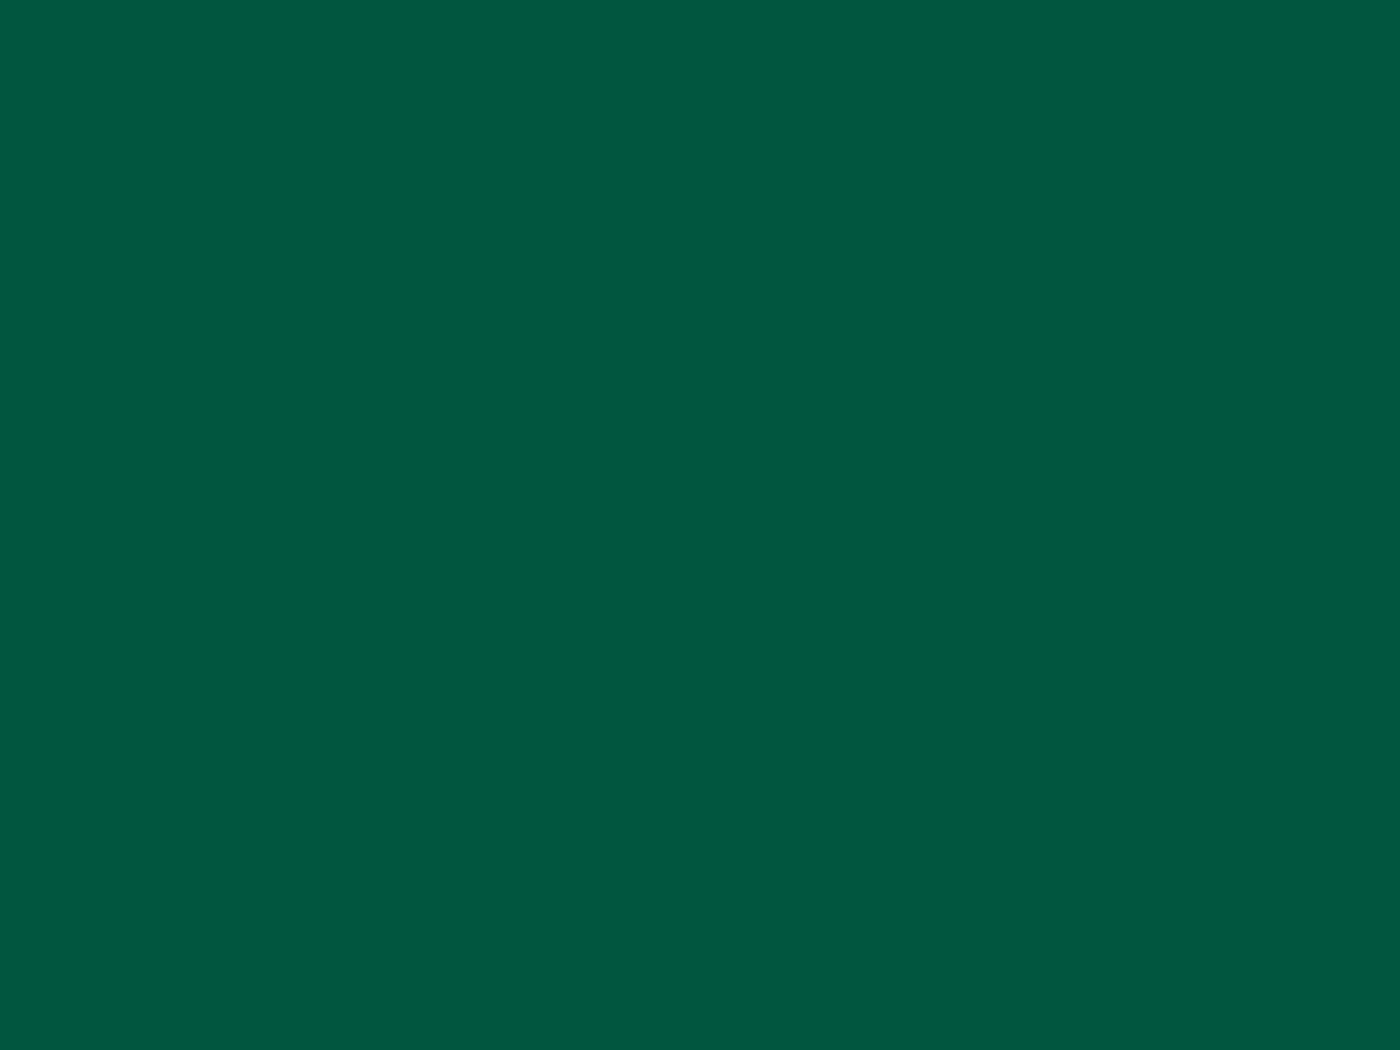 1400x1050 Castleton Green Solid Color Background